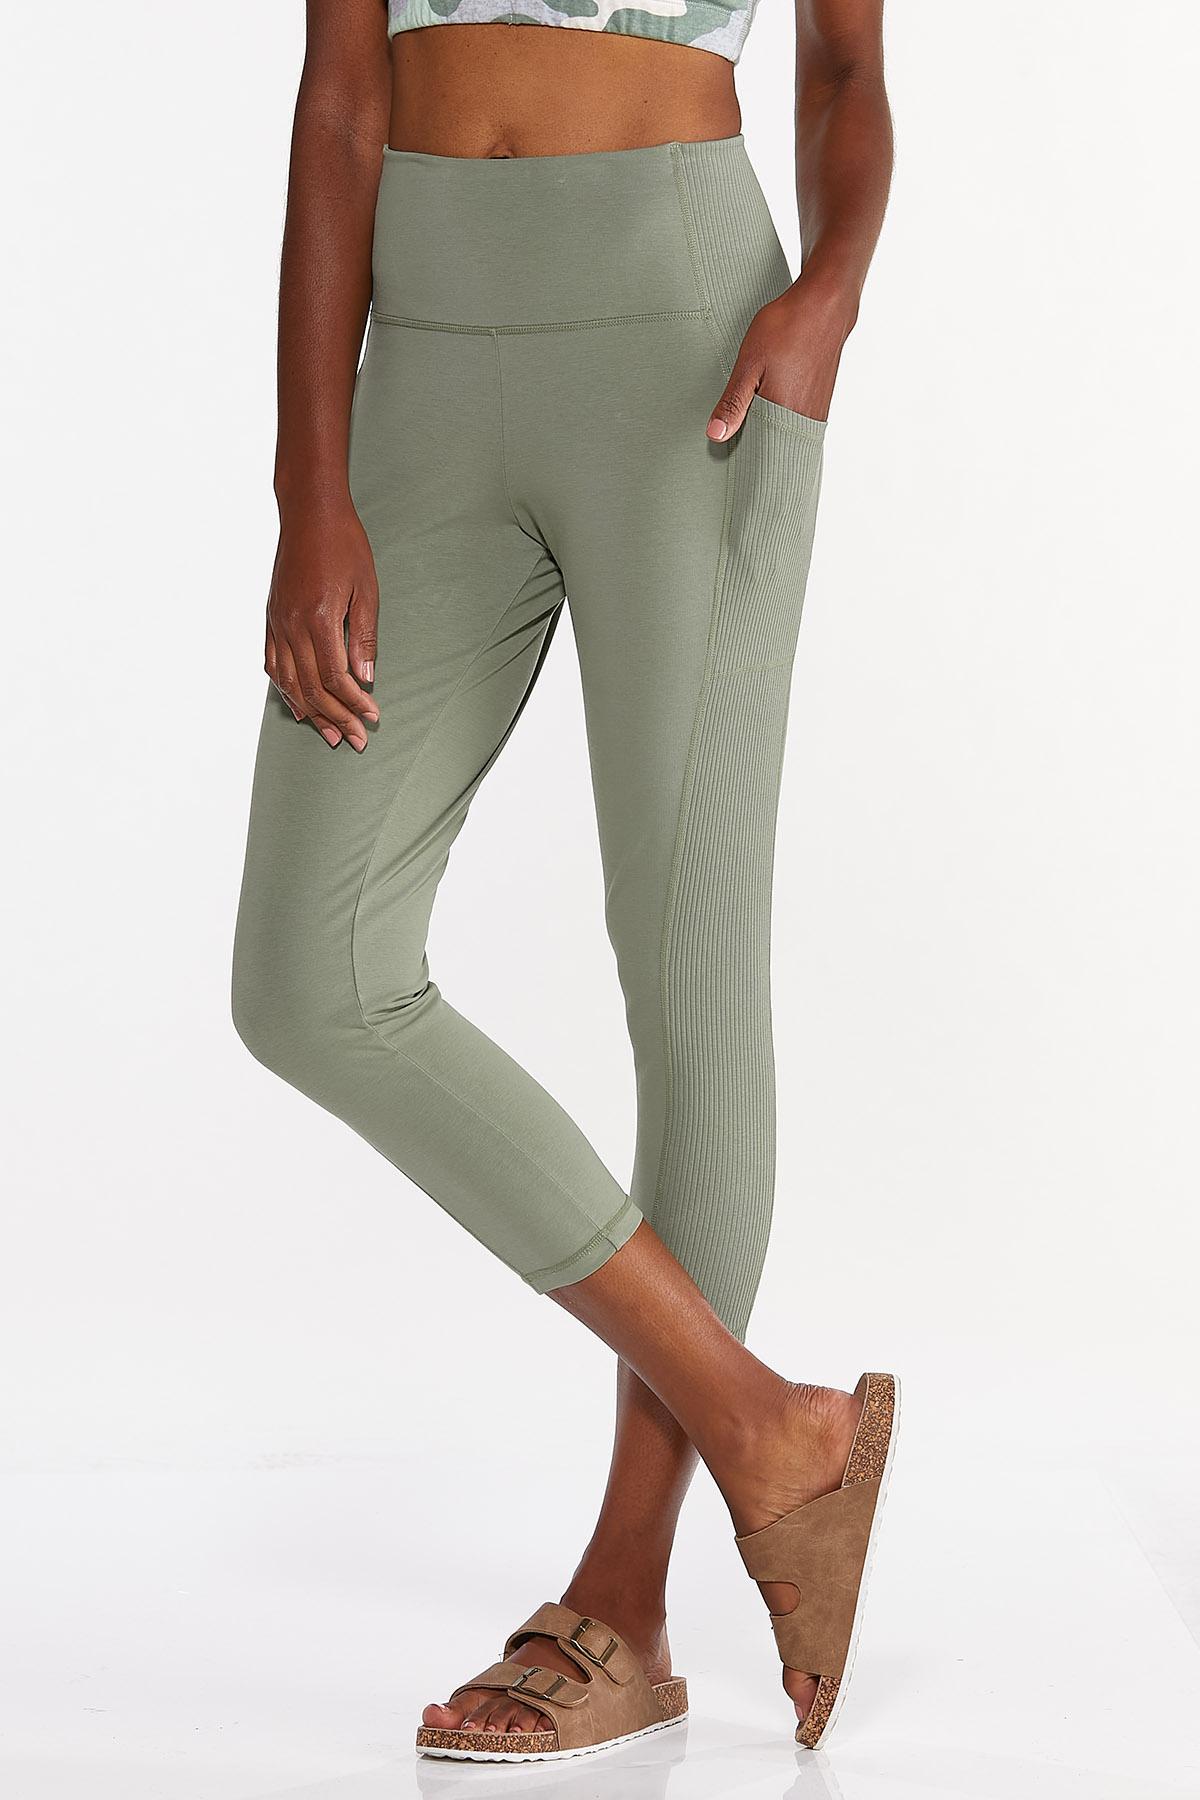 Cropped Side Pocket Leggings (Item #44634075)